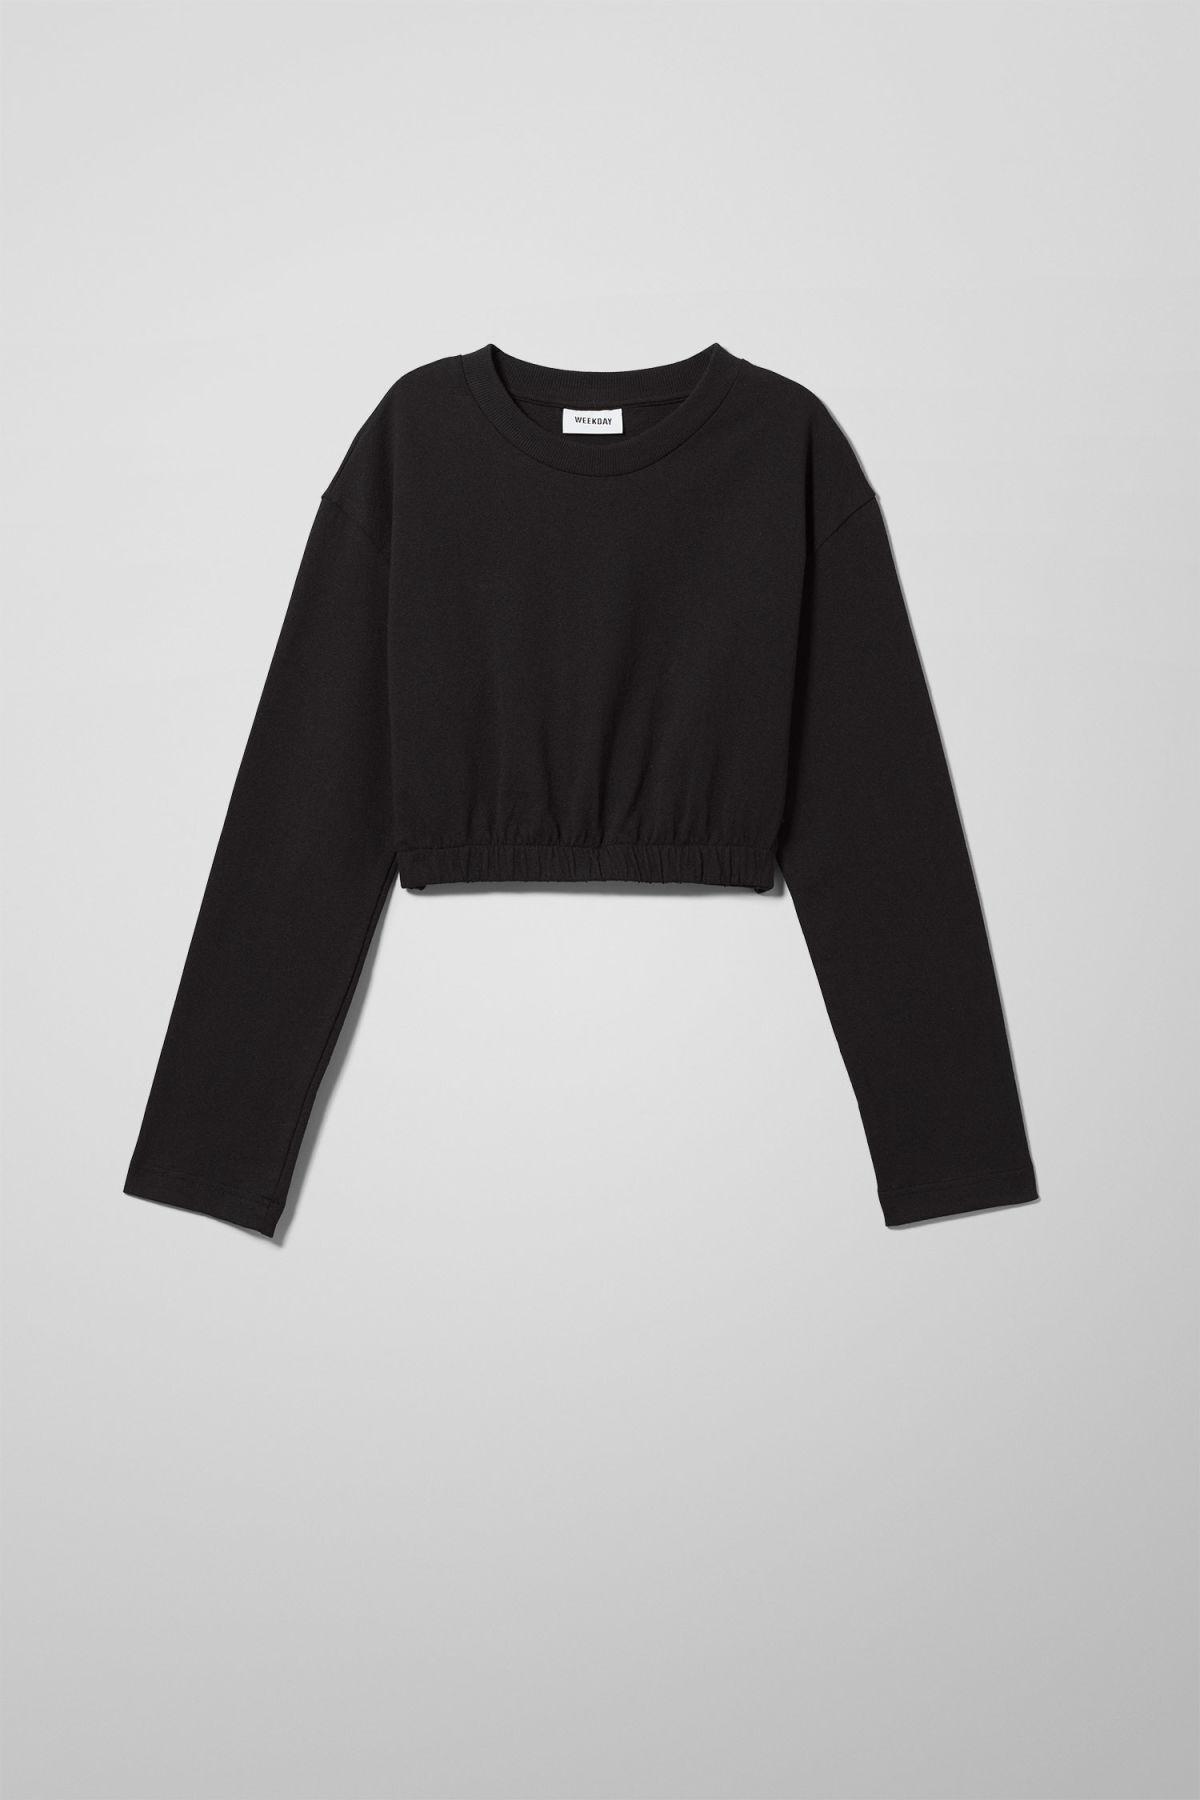 Image of Elin Cropped Long Sleeve - Black-XS